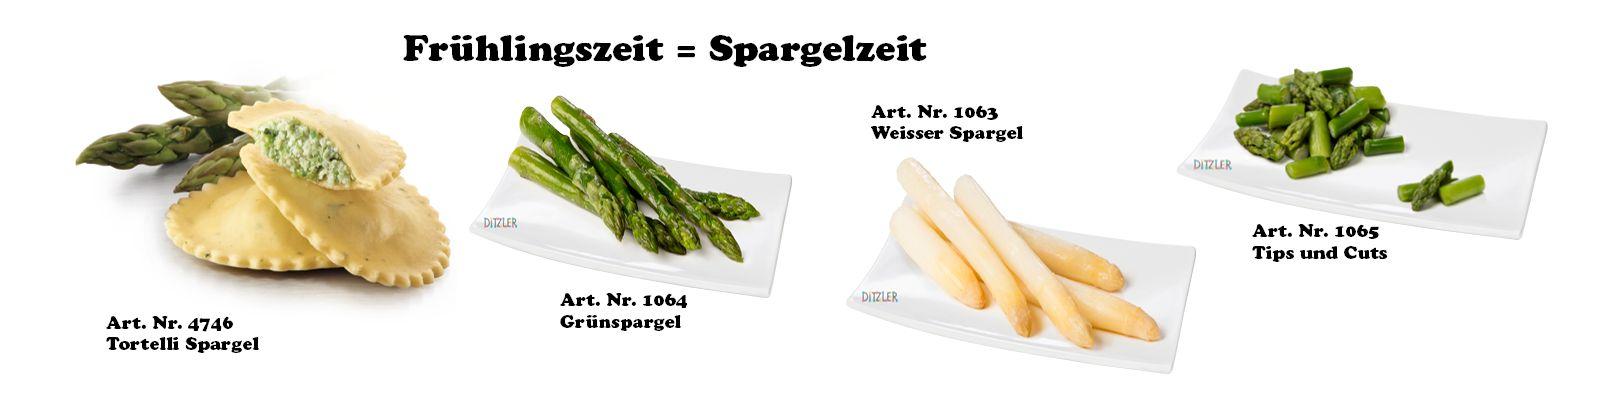 Spargel_2020